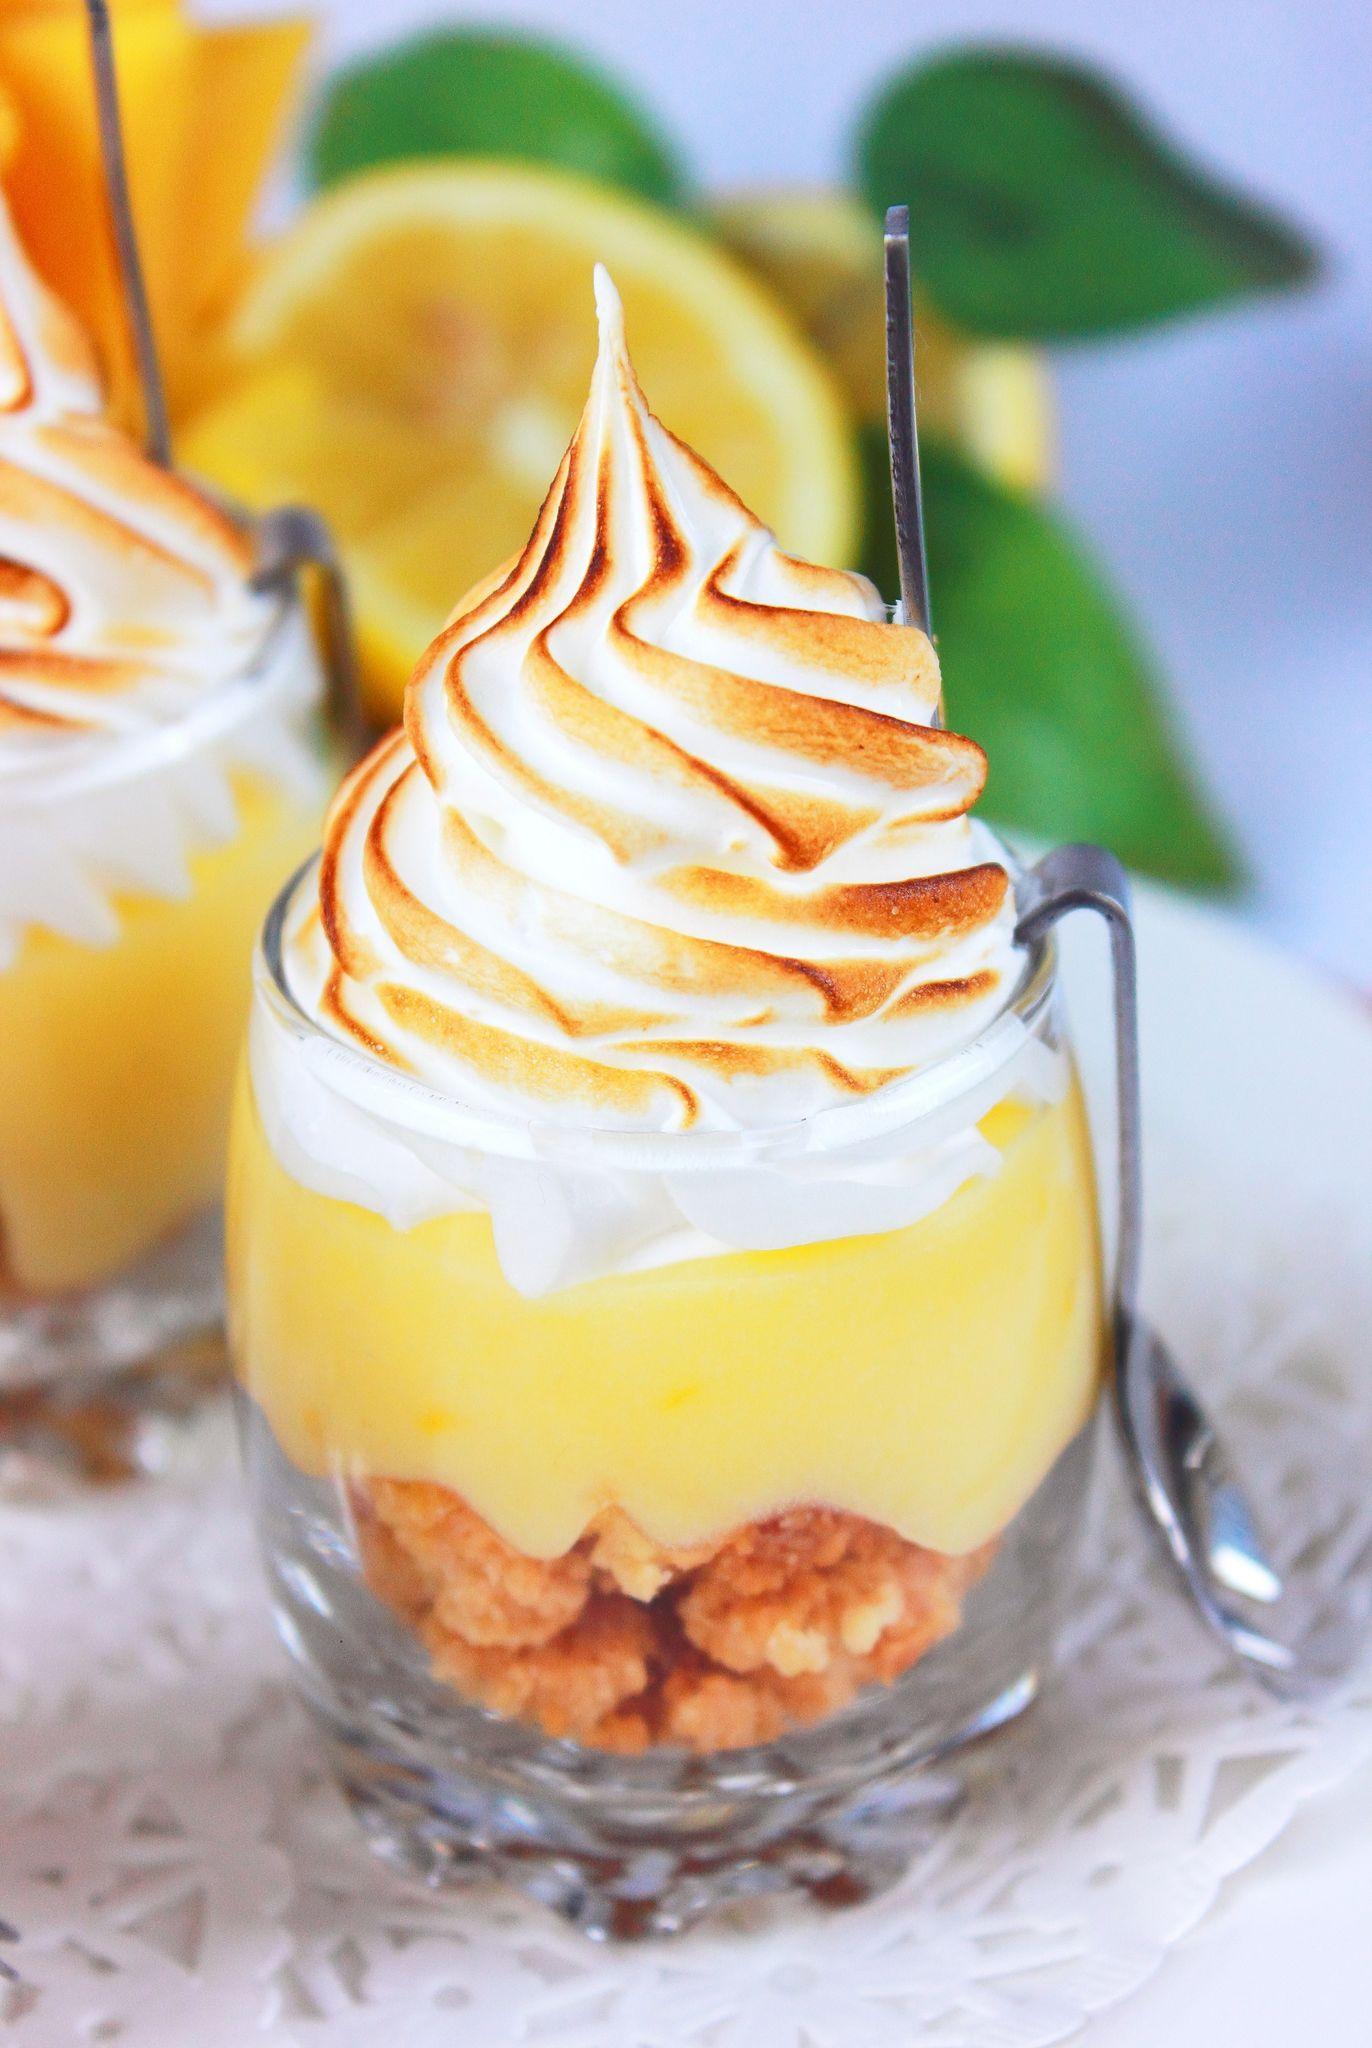 Tarte au citron meringu e revisit e version verrine - Tarte au citron meringuee herve cuisine ...